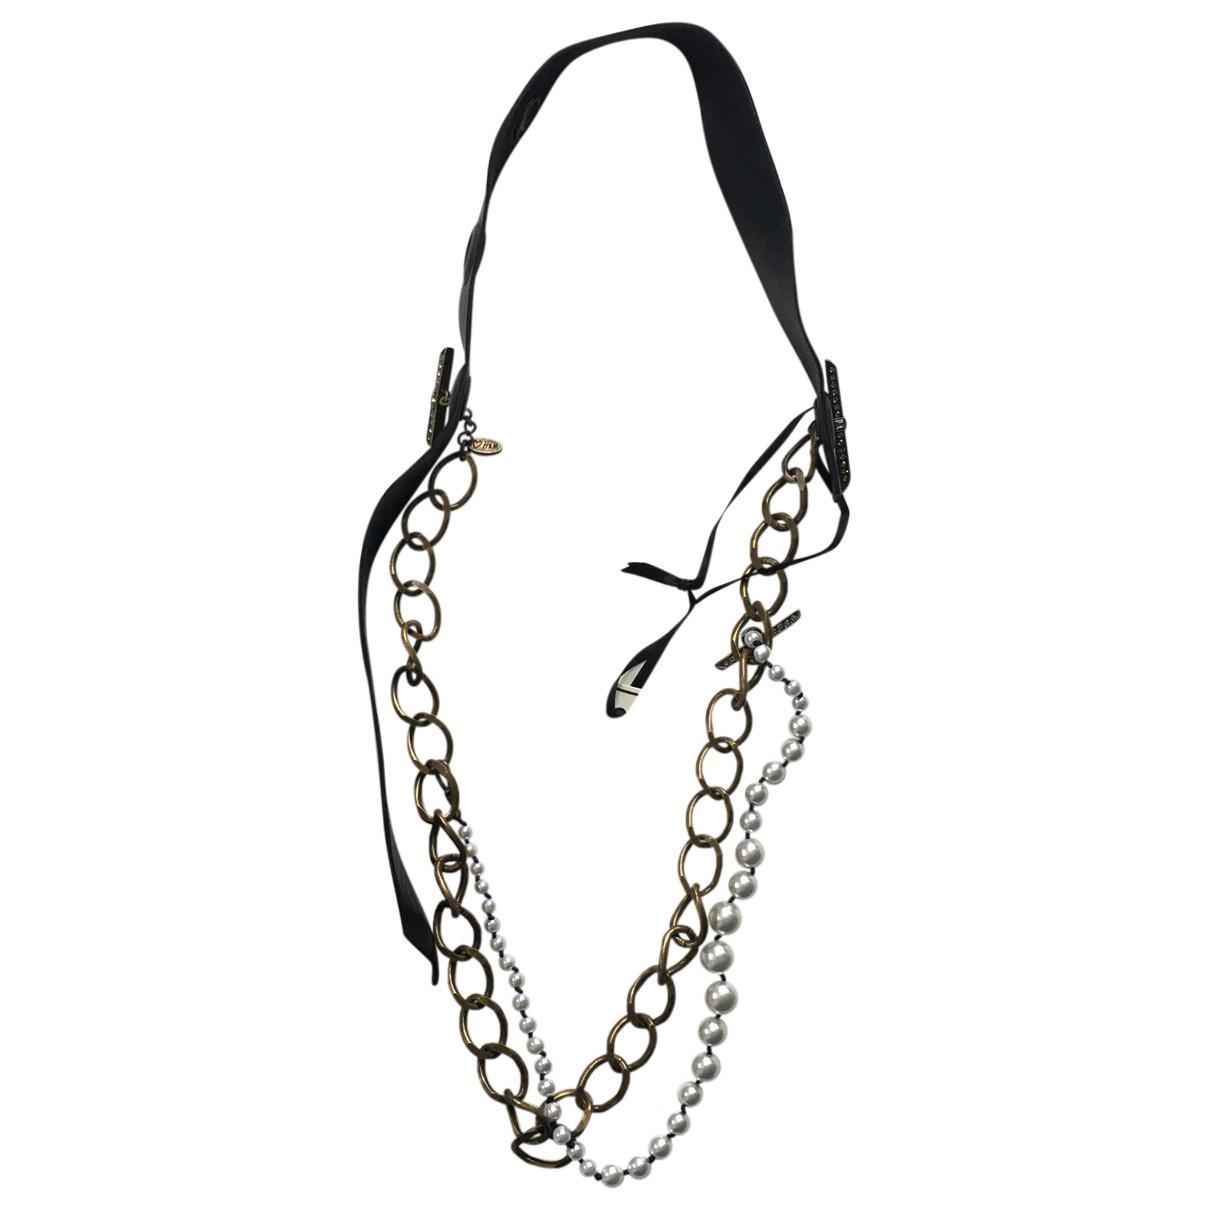 Collar largo Lanvin For H&m